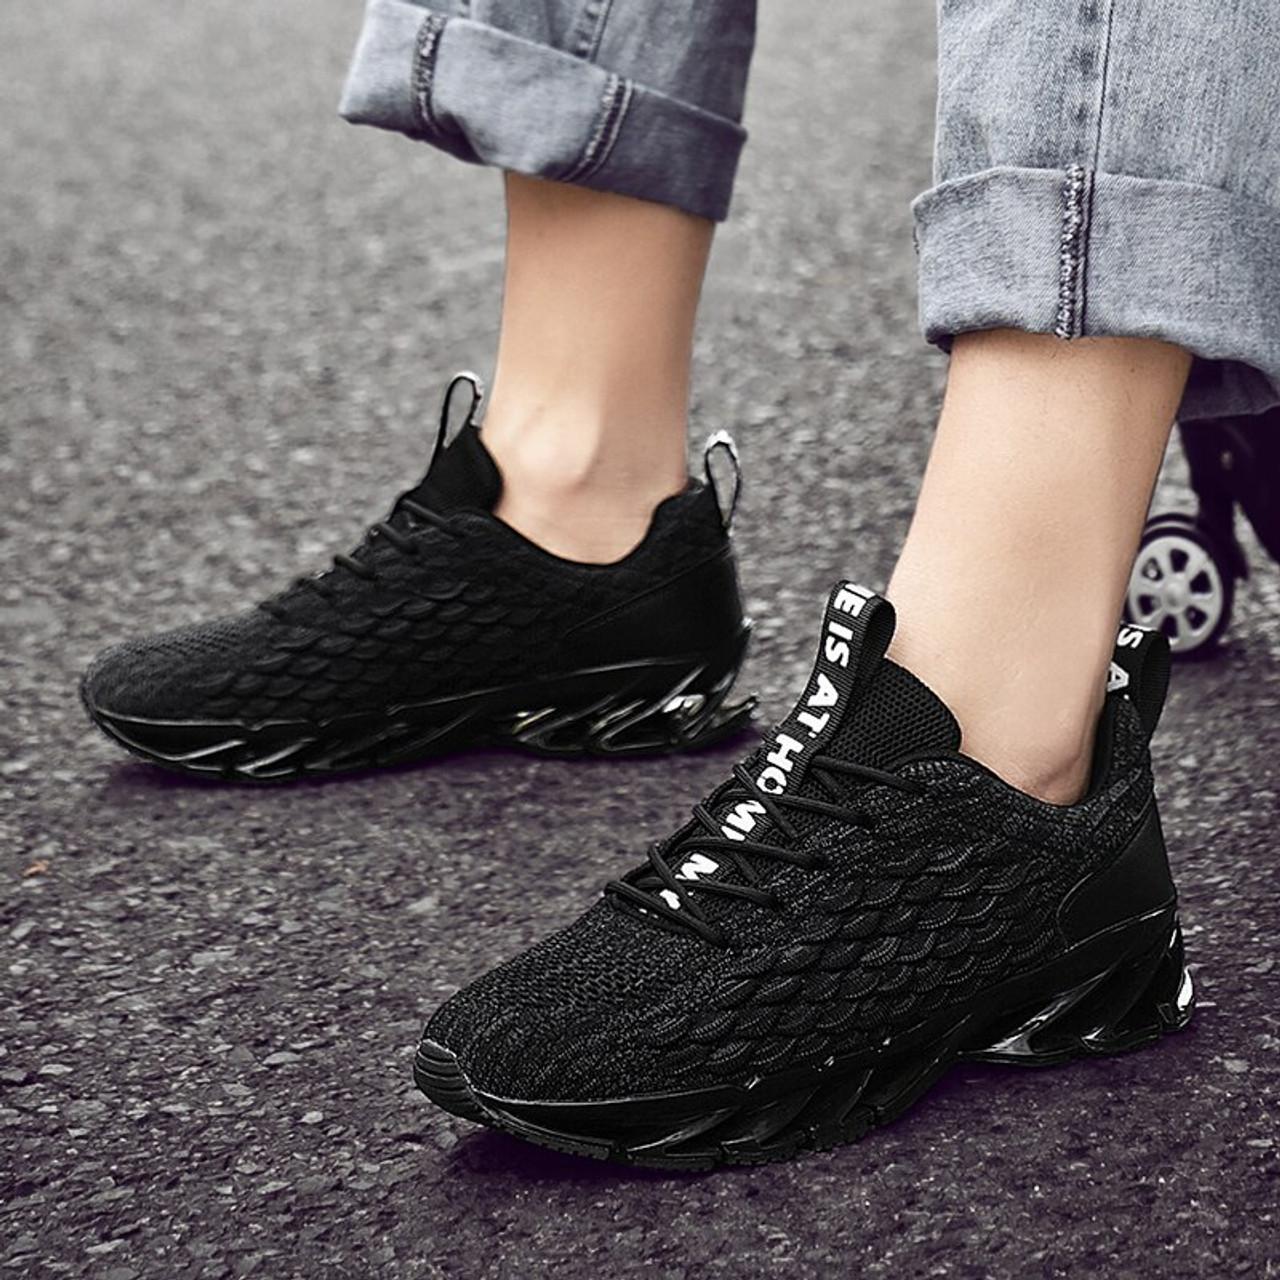 Damyuan 2019 New Autumn Casual Shoes